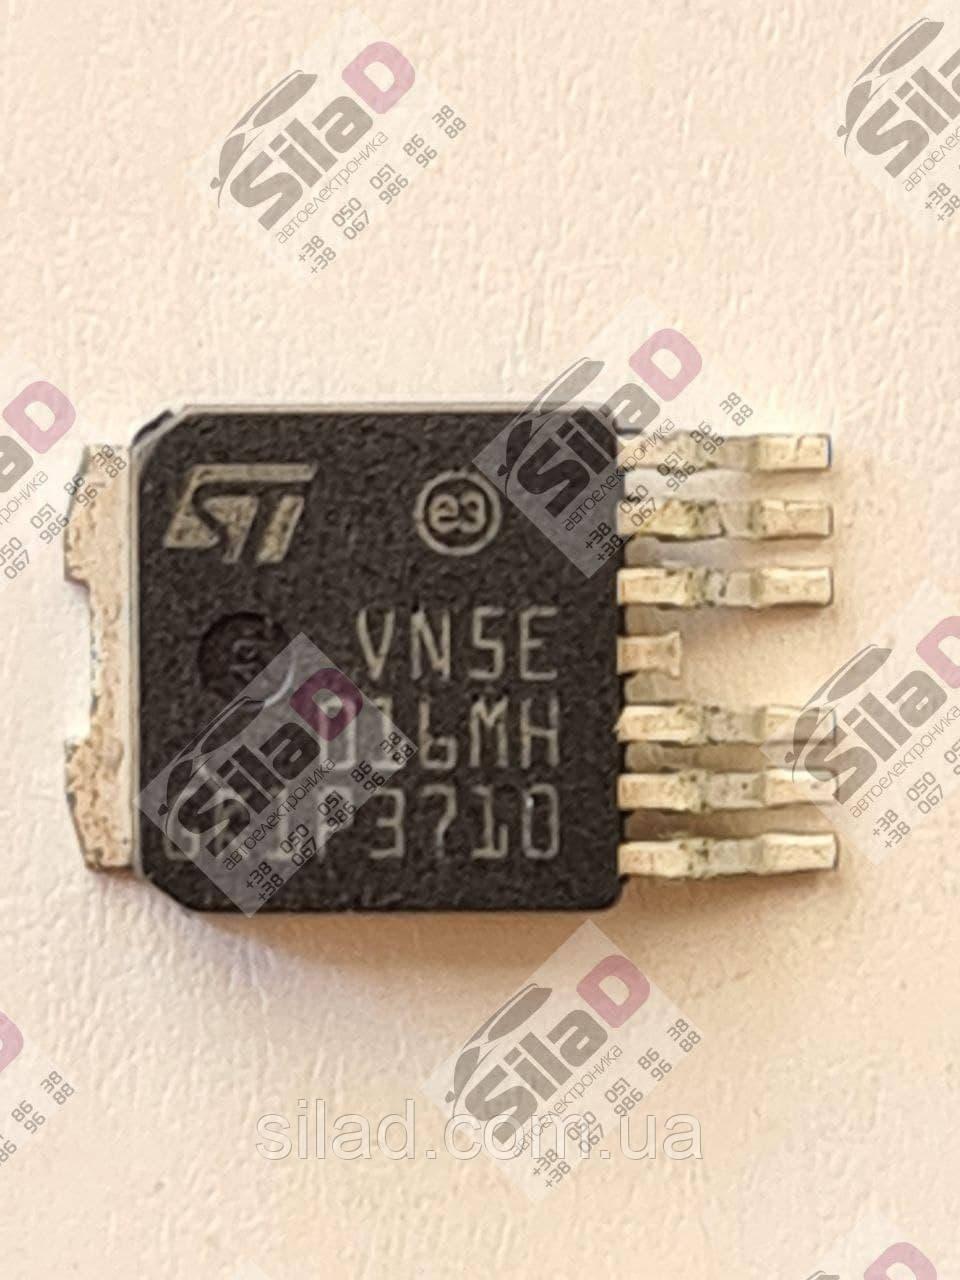 Микросхема VN5E016MH STMicroelectronics корпус ТО-252-7 HPAK-6